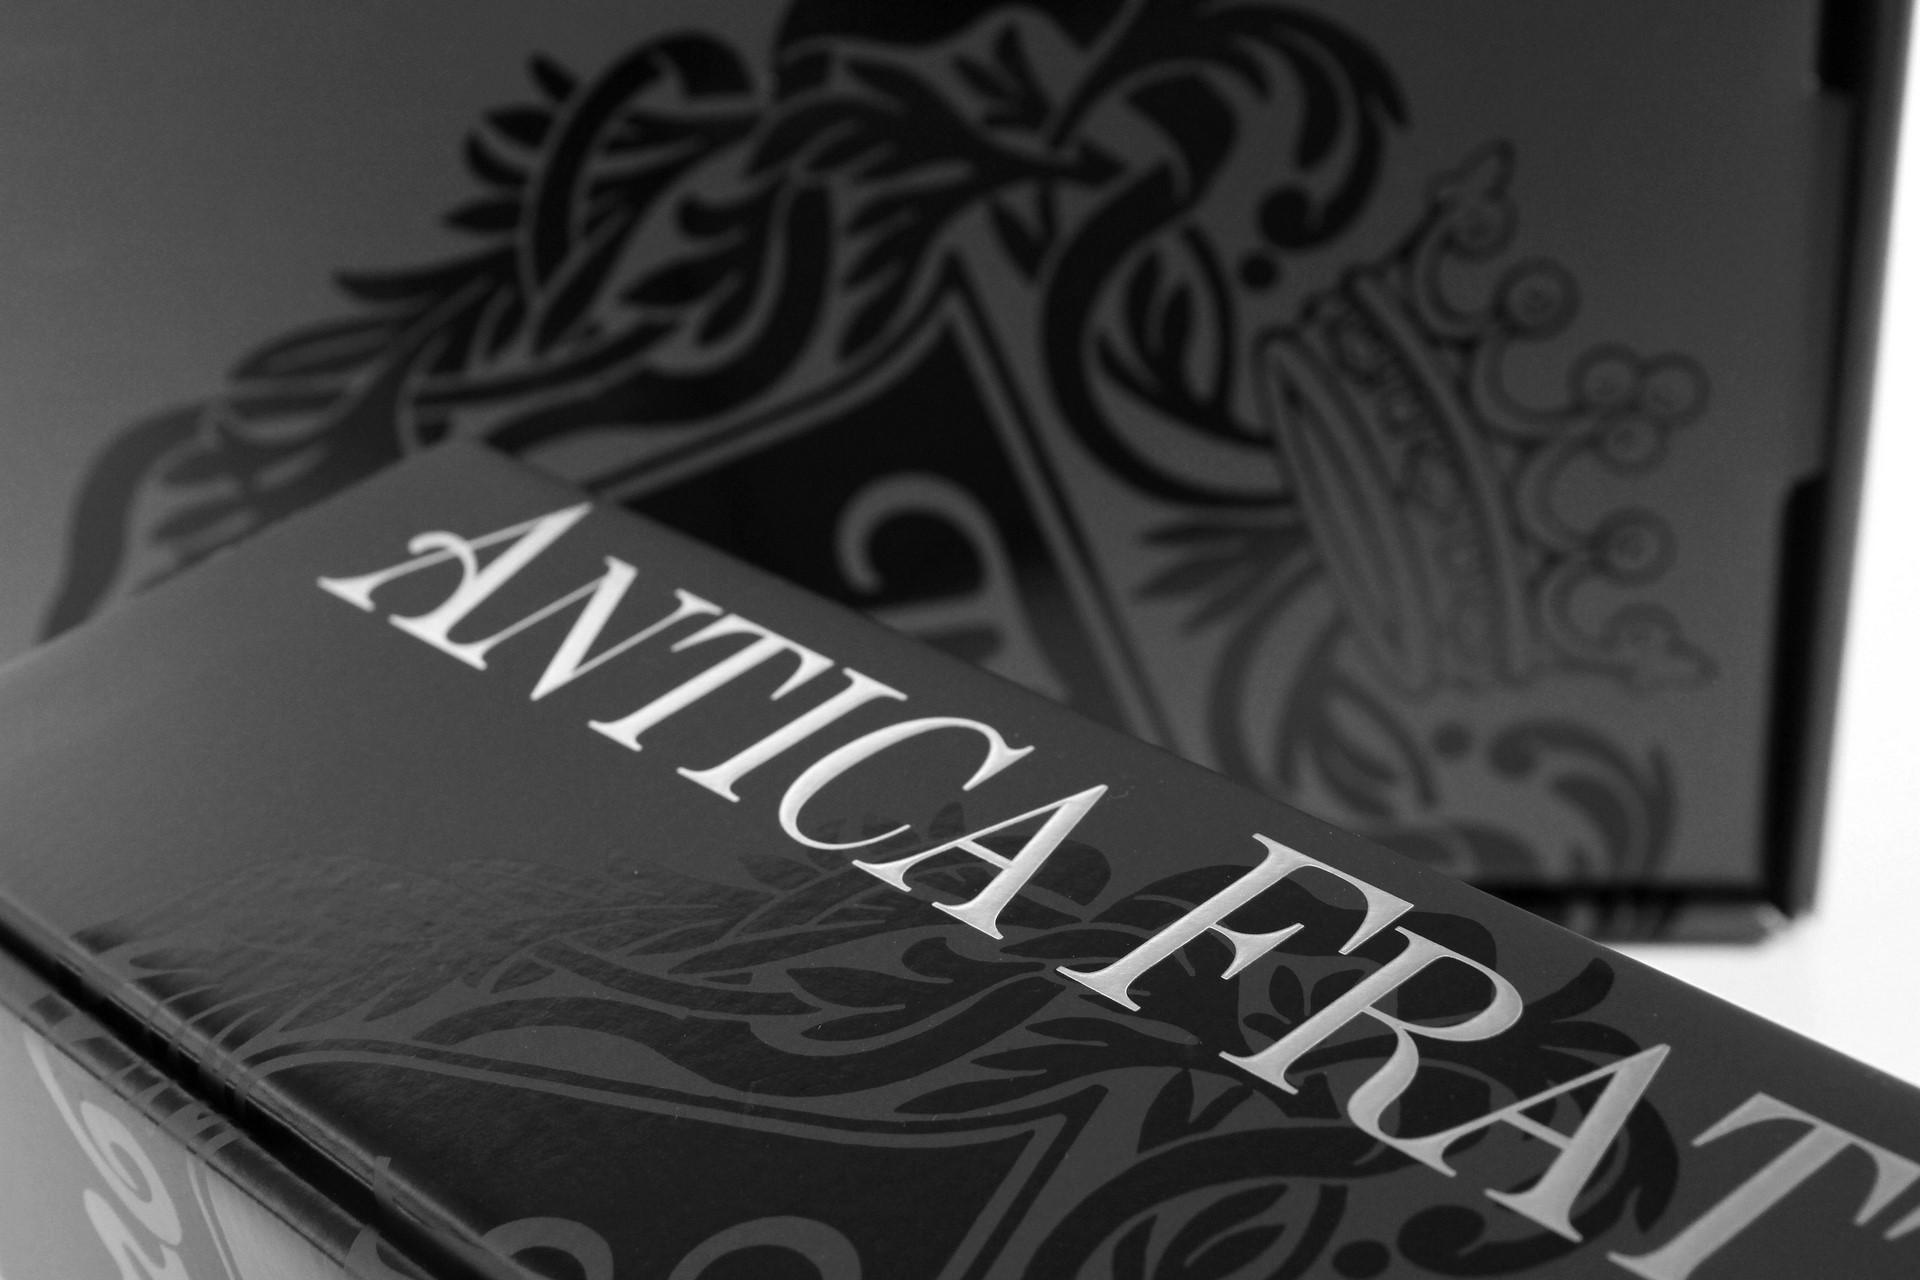 anticafratta002